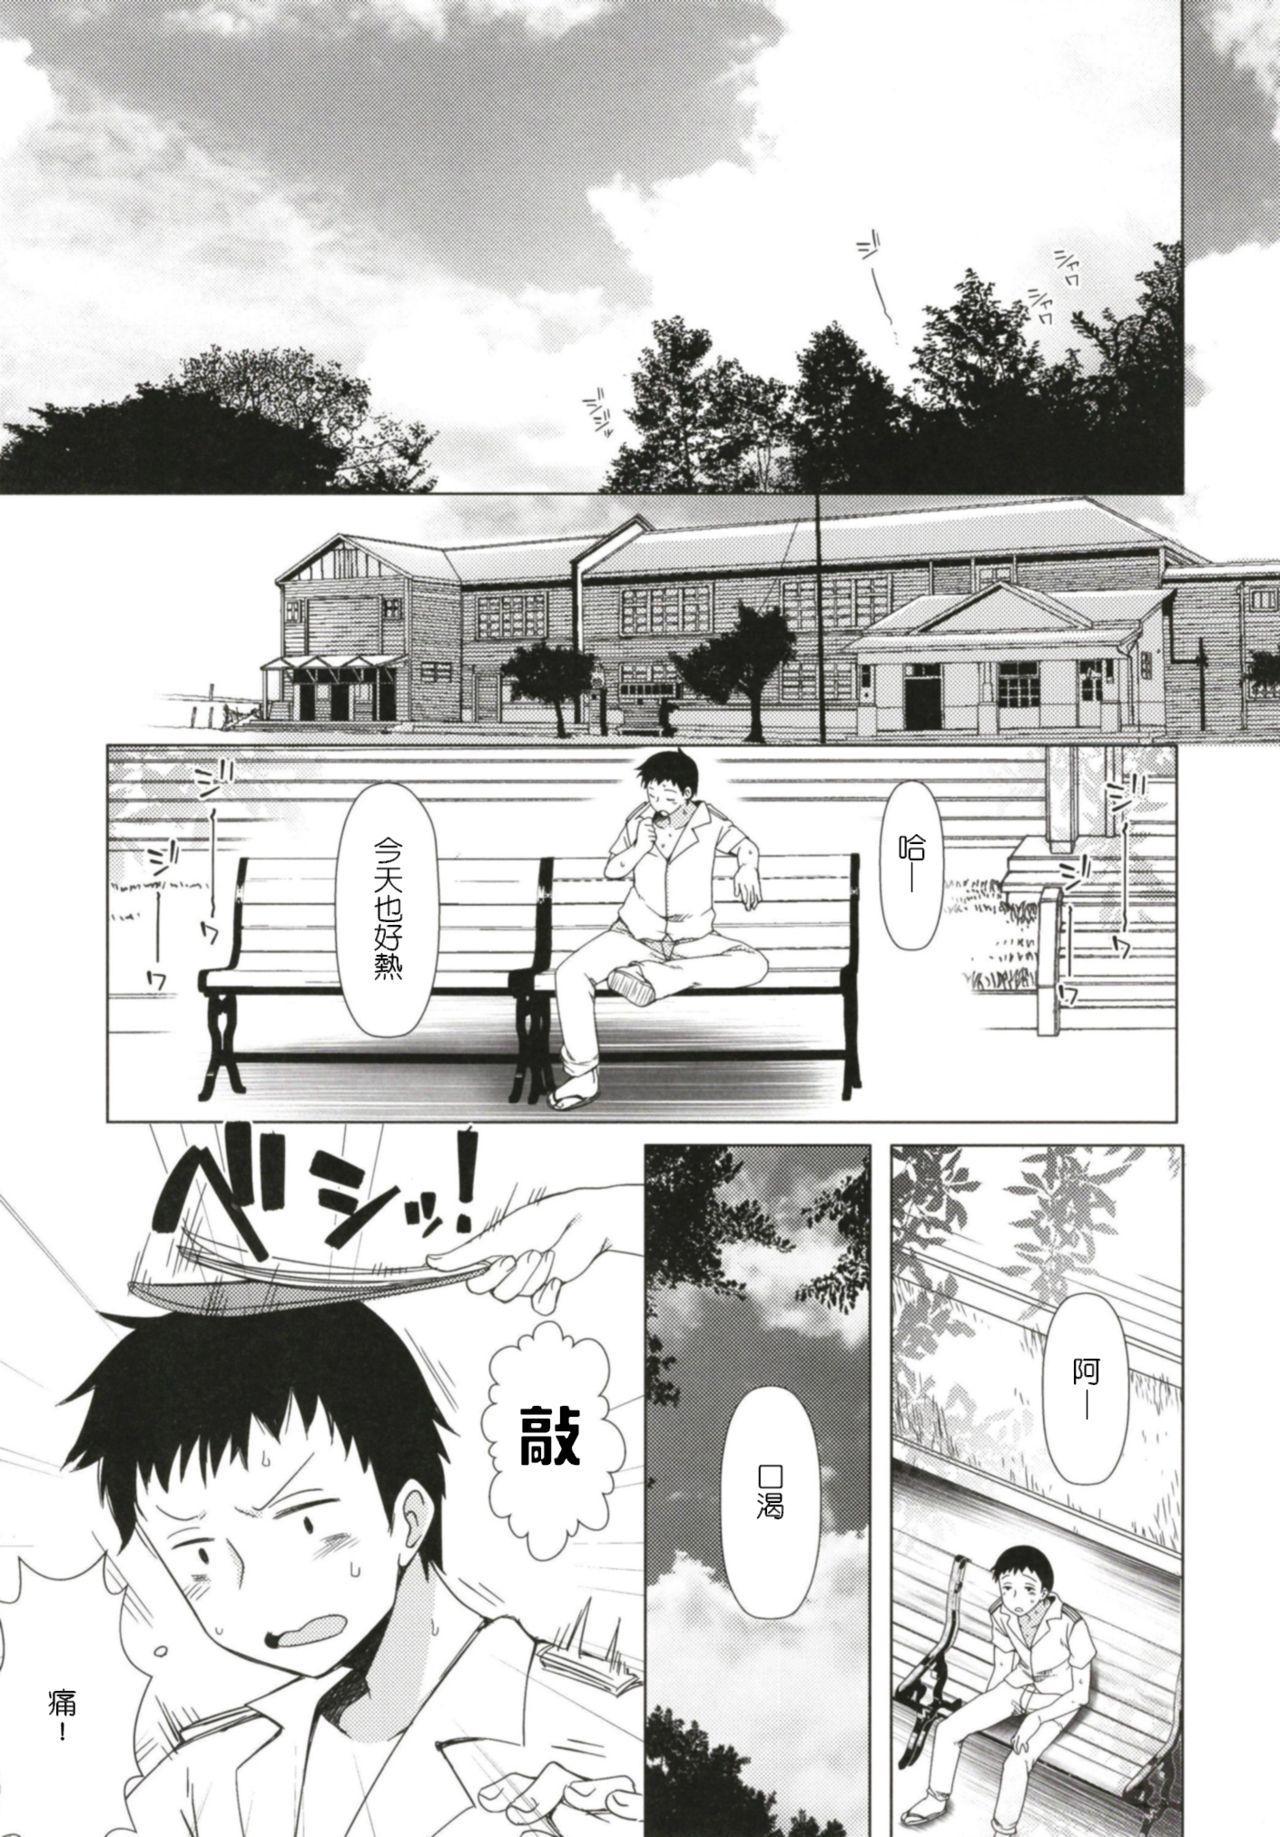 [French letter (Fujisaki Hikari)] Hitonatsu no Ayamachi -I-401 Soushuuhen- (Kantai Collection -KanColle-) [Chinese] [Digital] 4